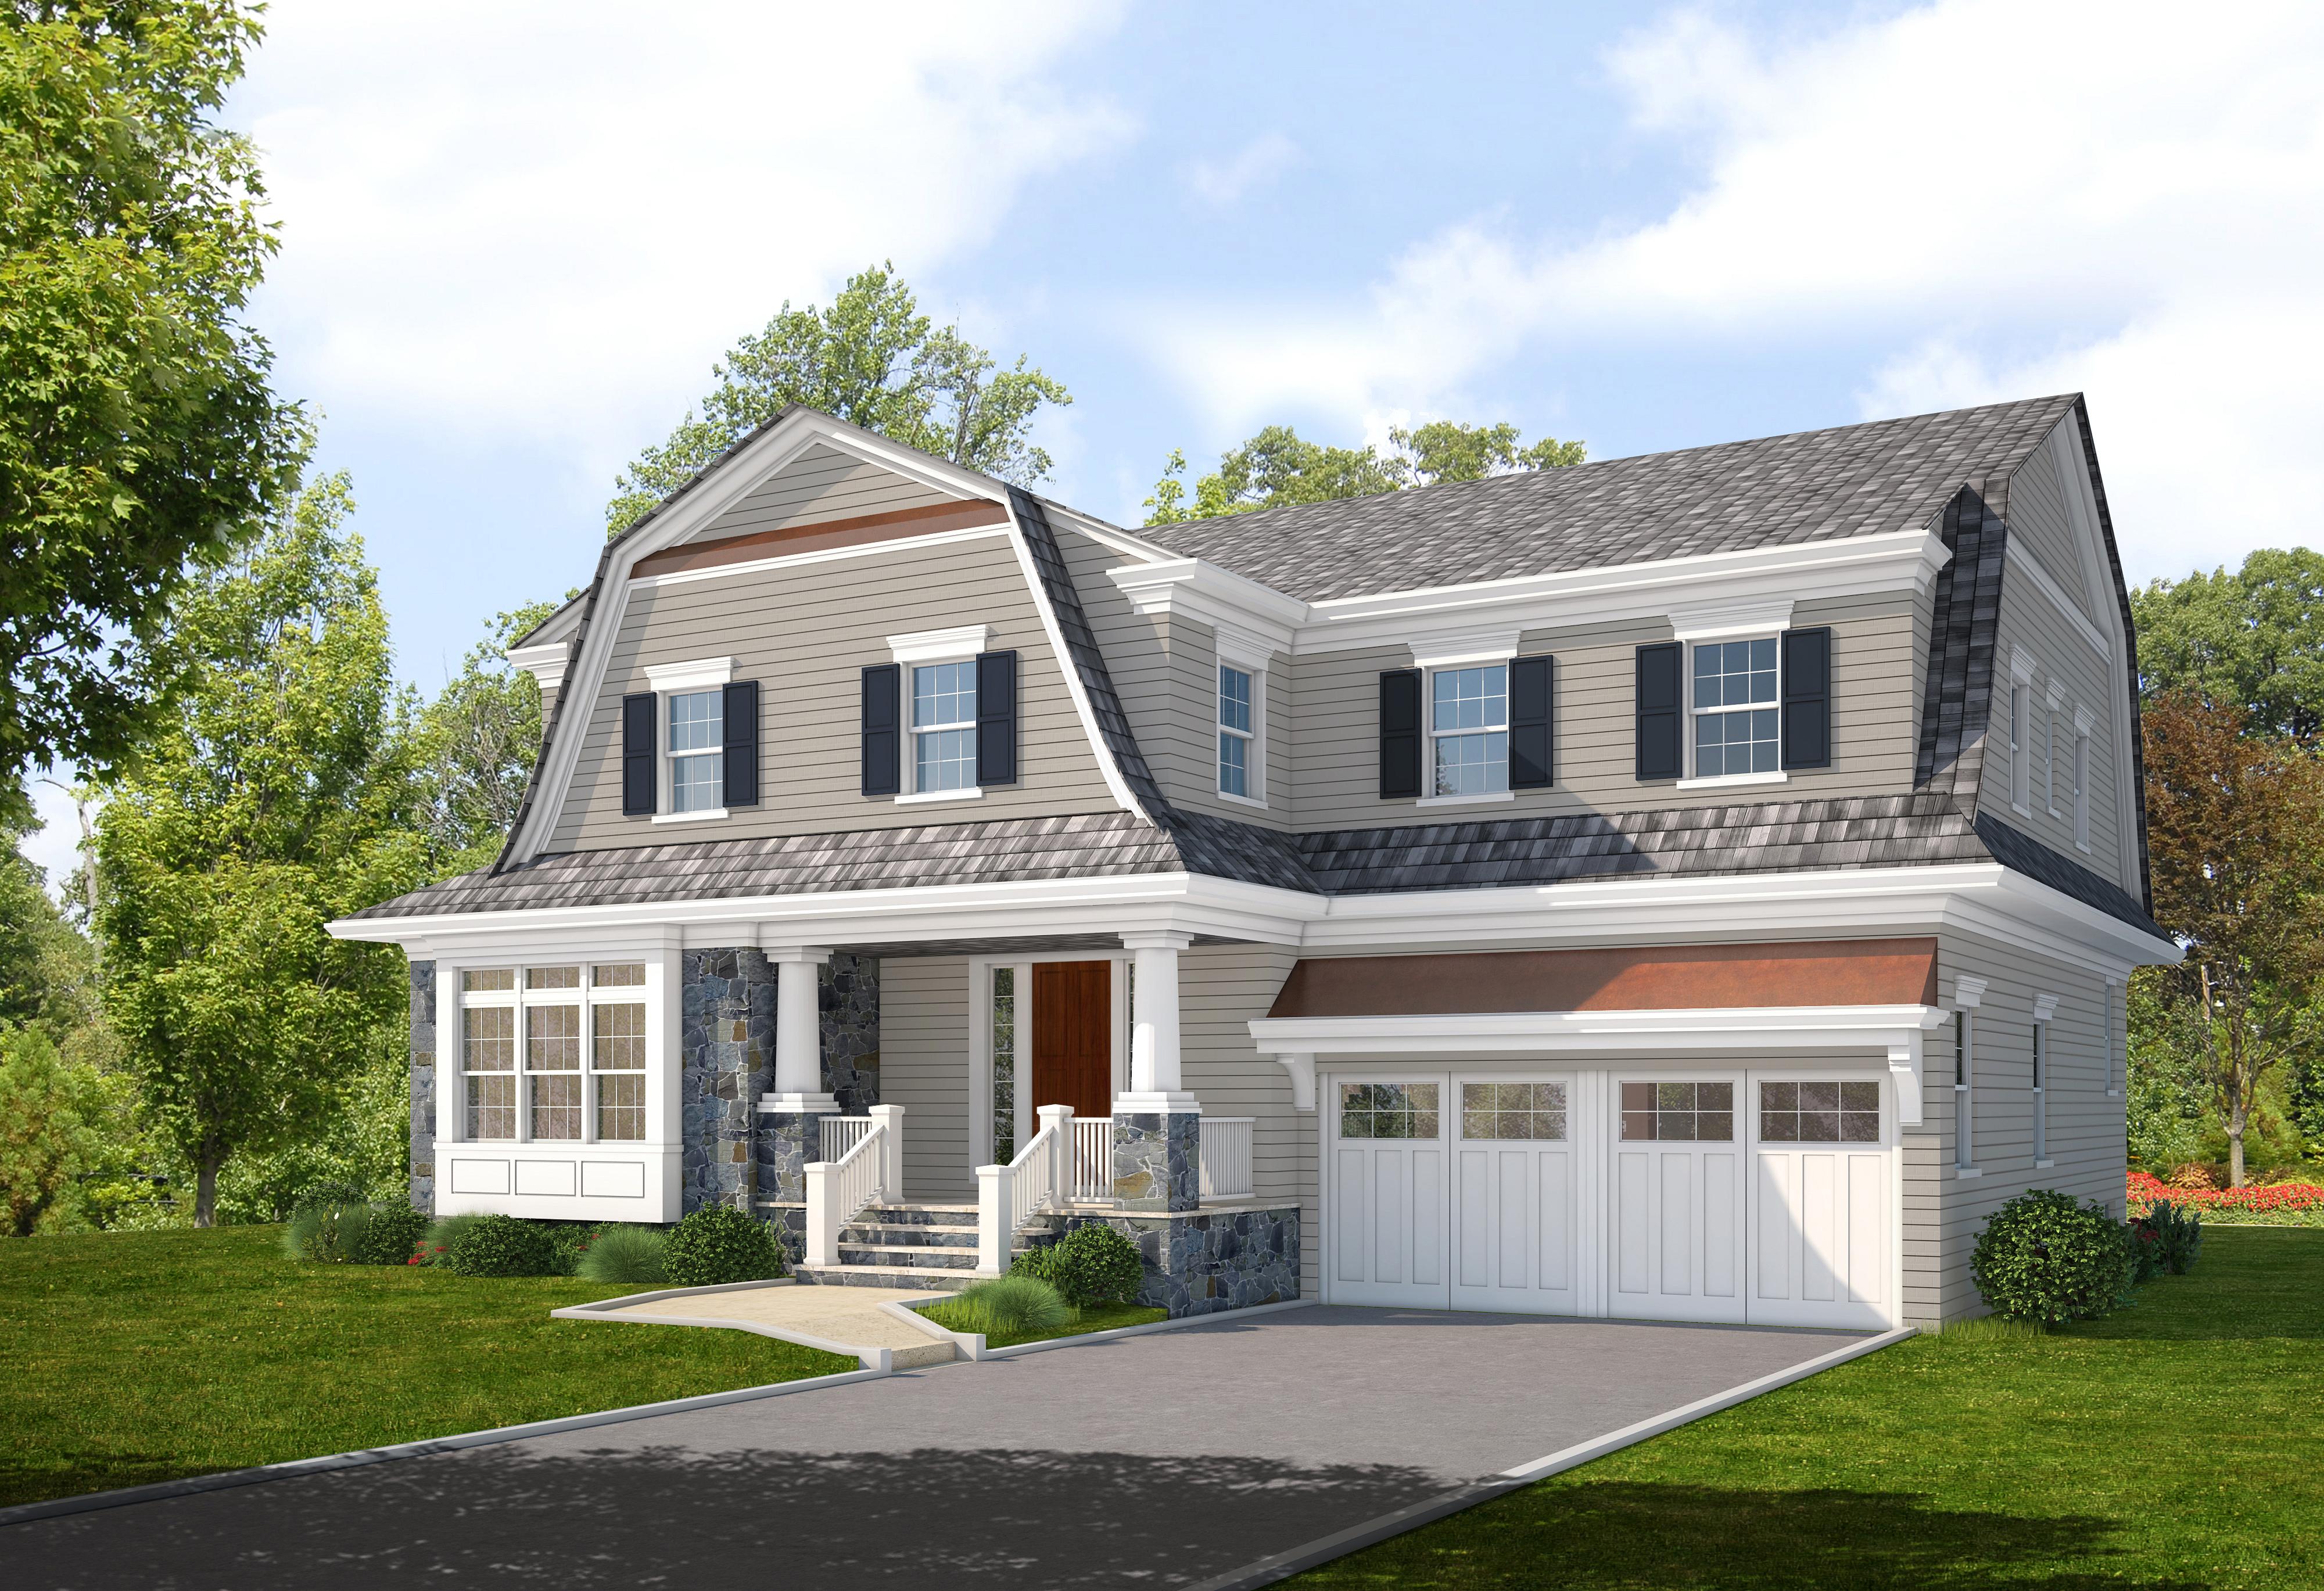 Moradia para Venda às Fabulous New Construction 42 Villa Road Larchmont, Nova York 10538 Estados Unidos